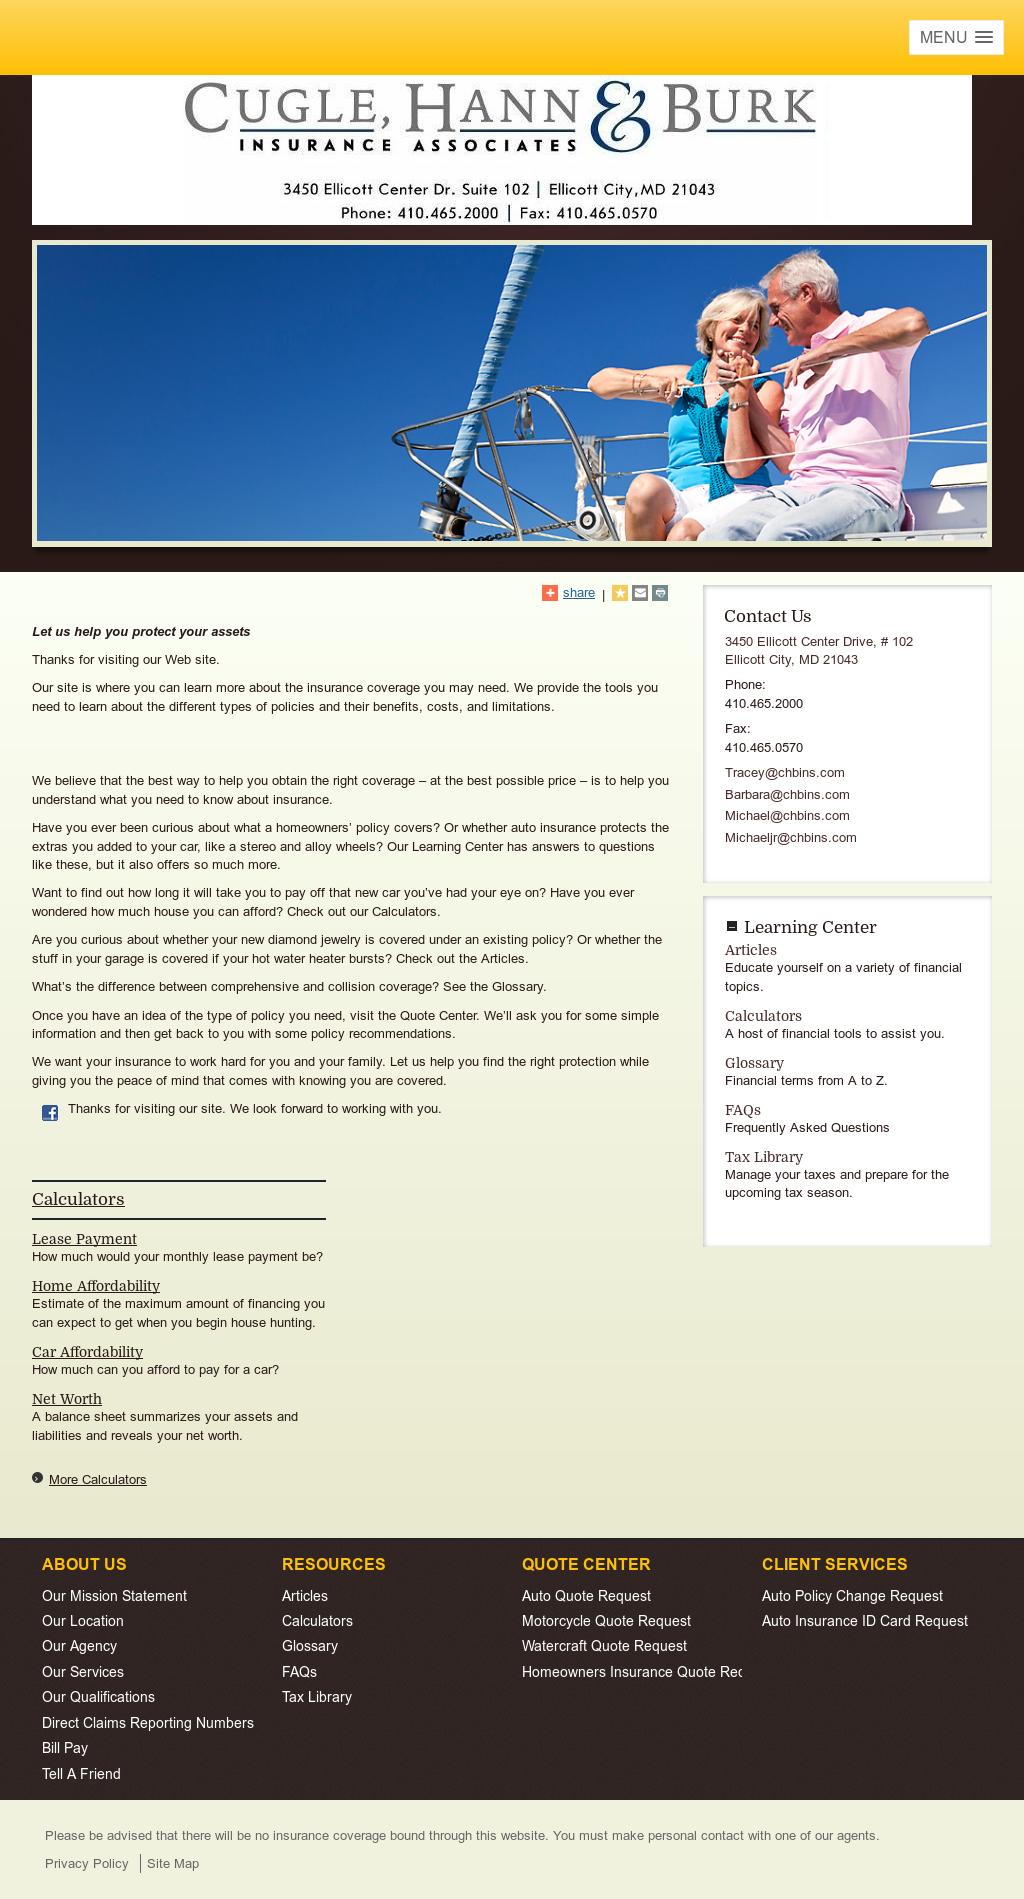 Cugle, Hann & Burk Insurance Associates Competitors, Revenue